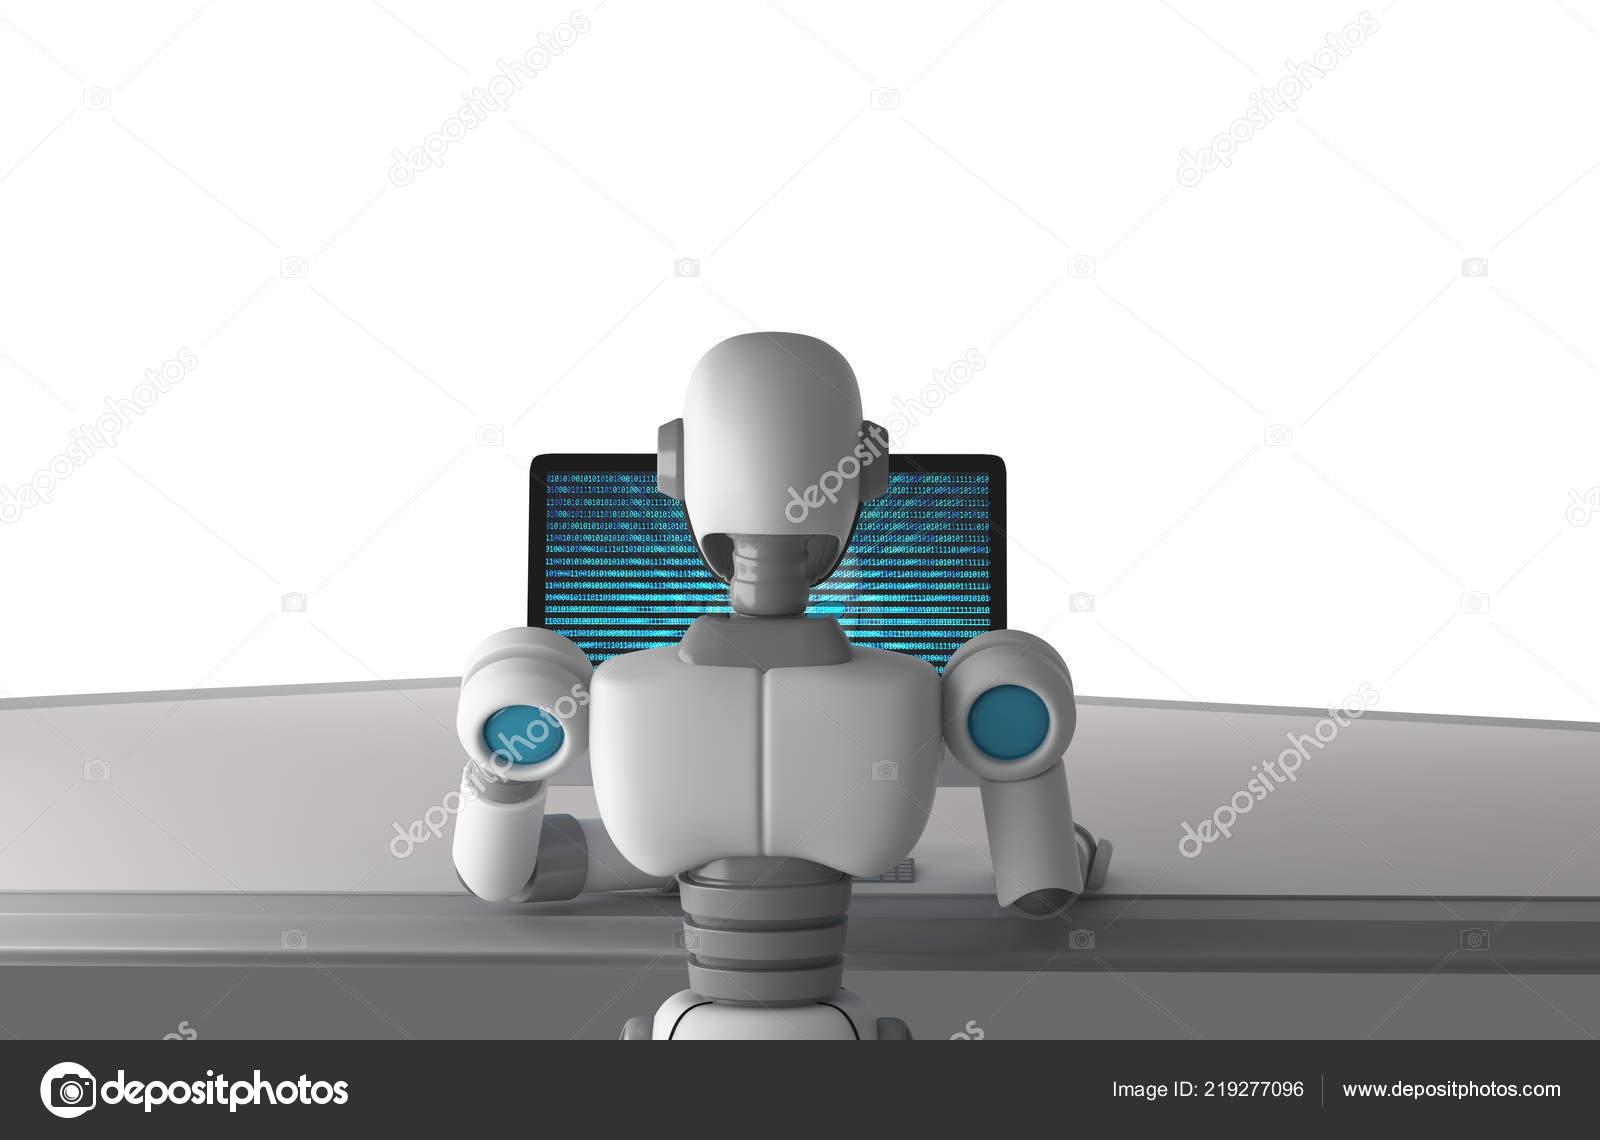 depozit binar de robot câștigați bani pe extensiile de gene